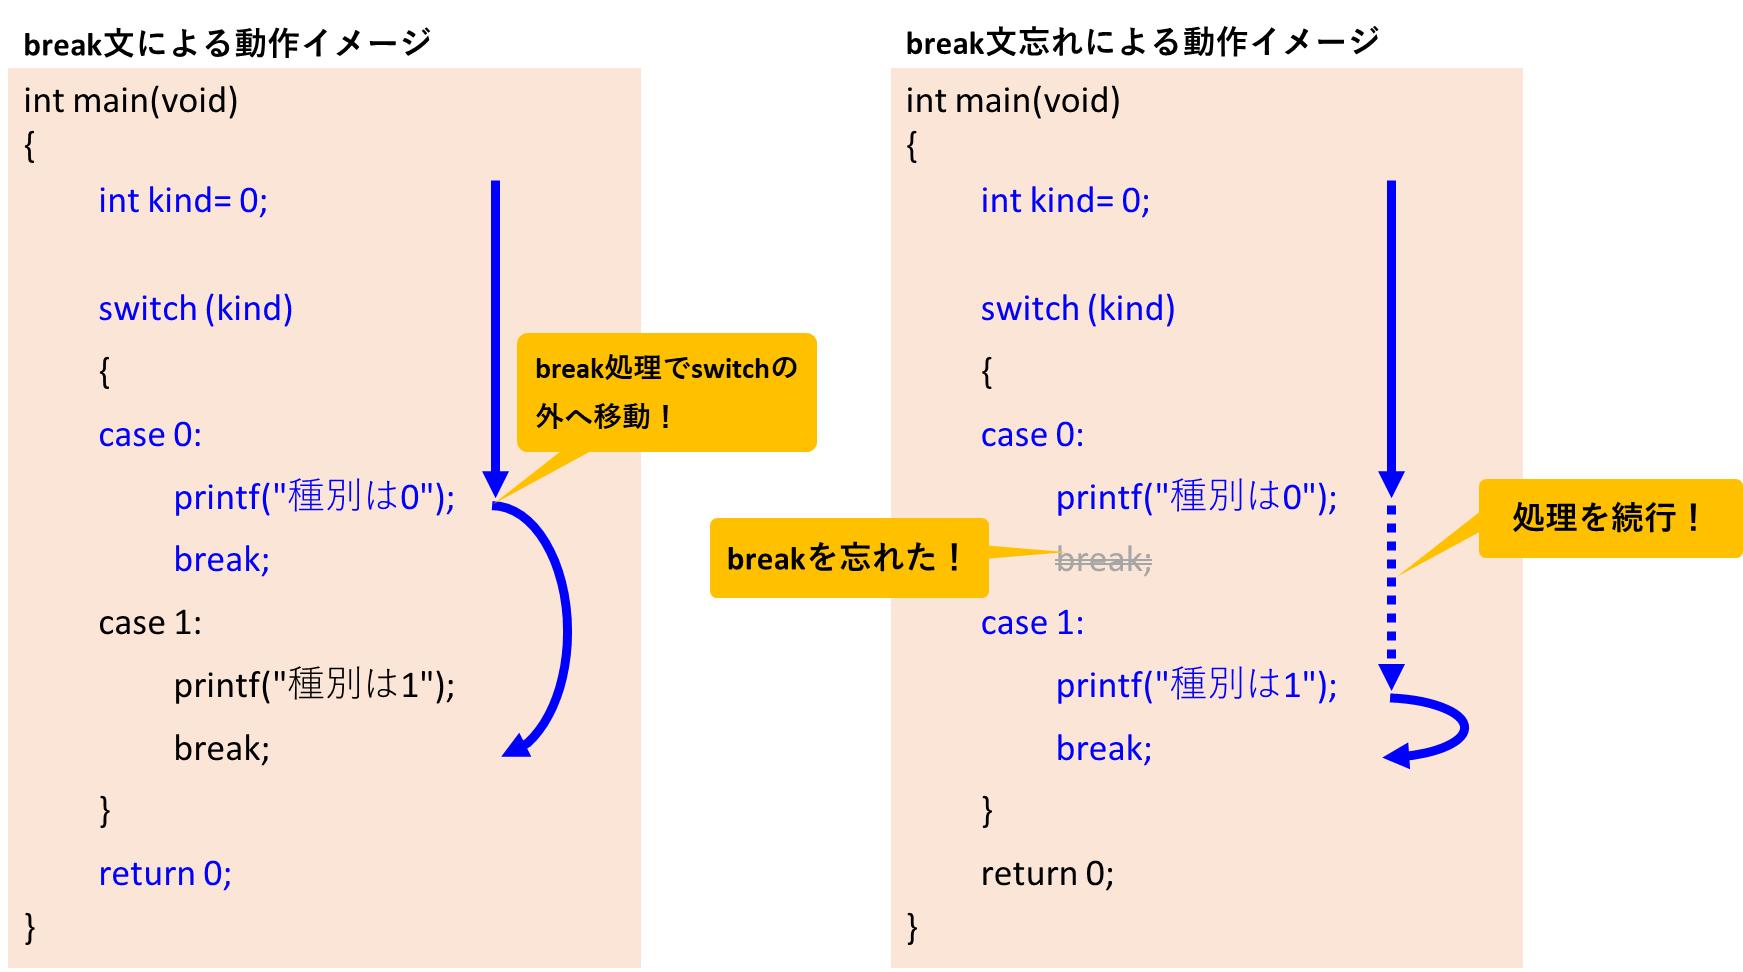 break文の処理イメージ